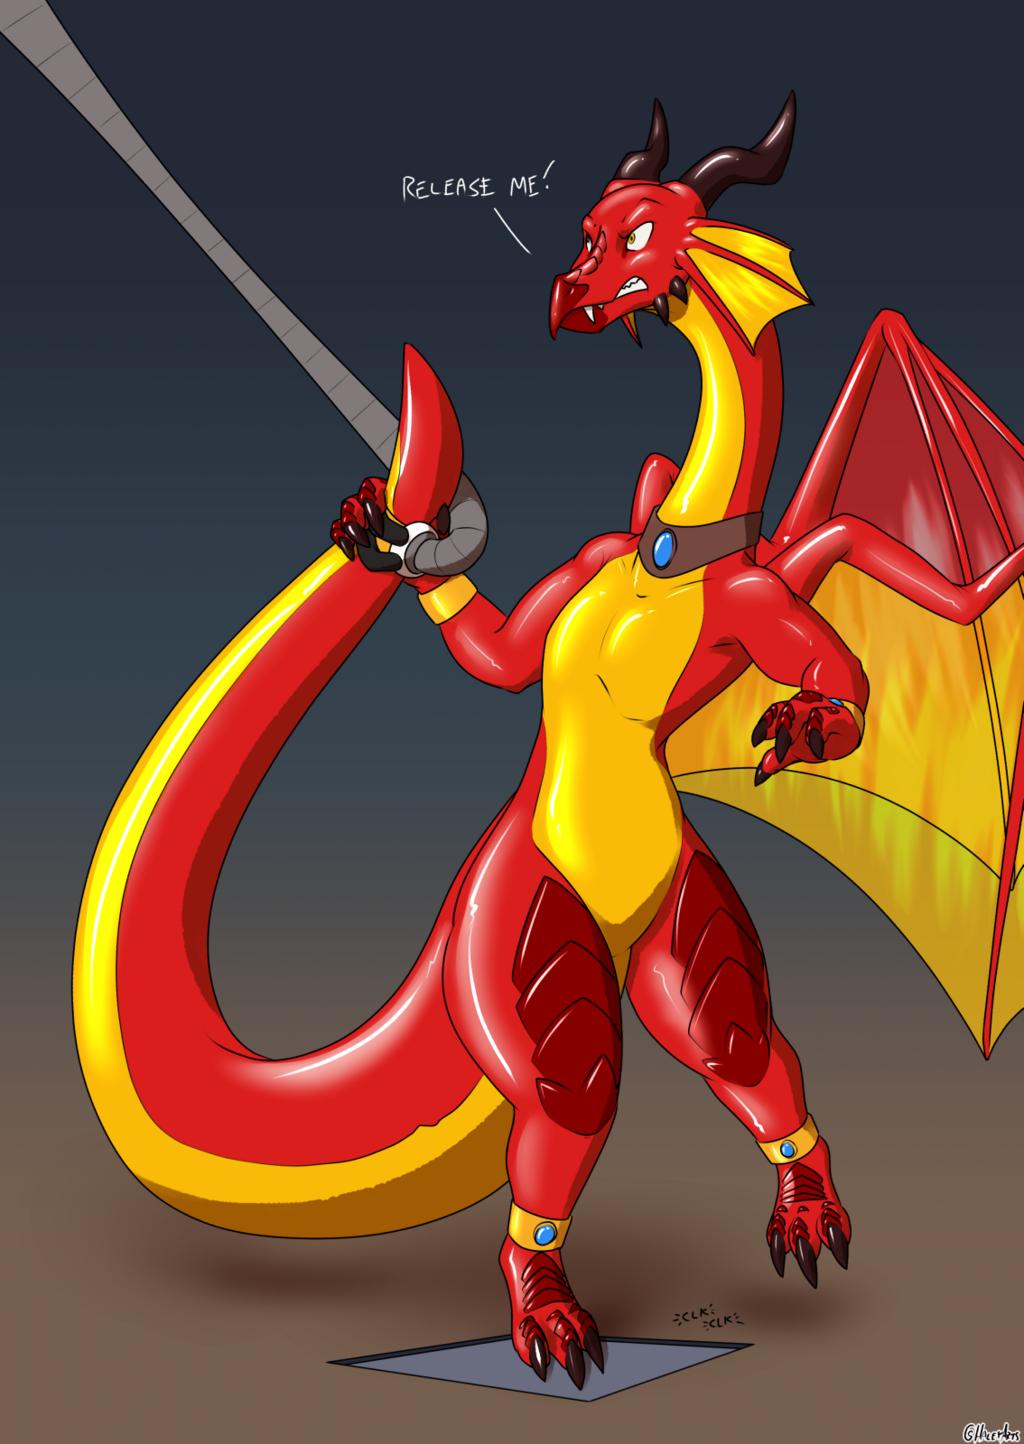 Avarisa the Inflatable Dragon #7